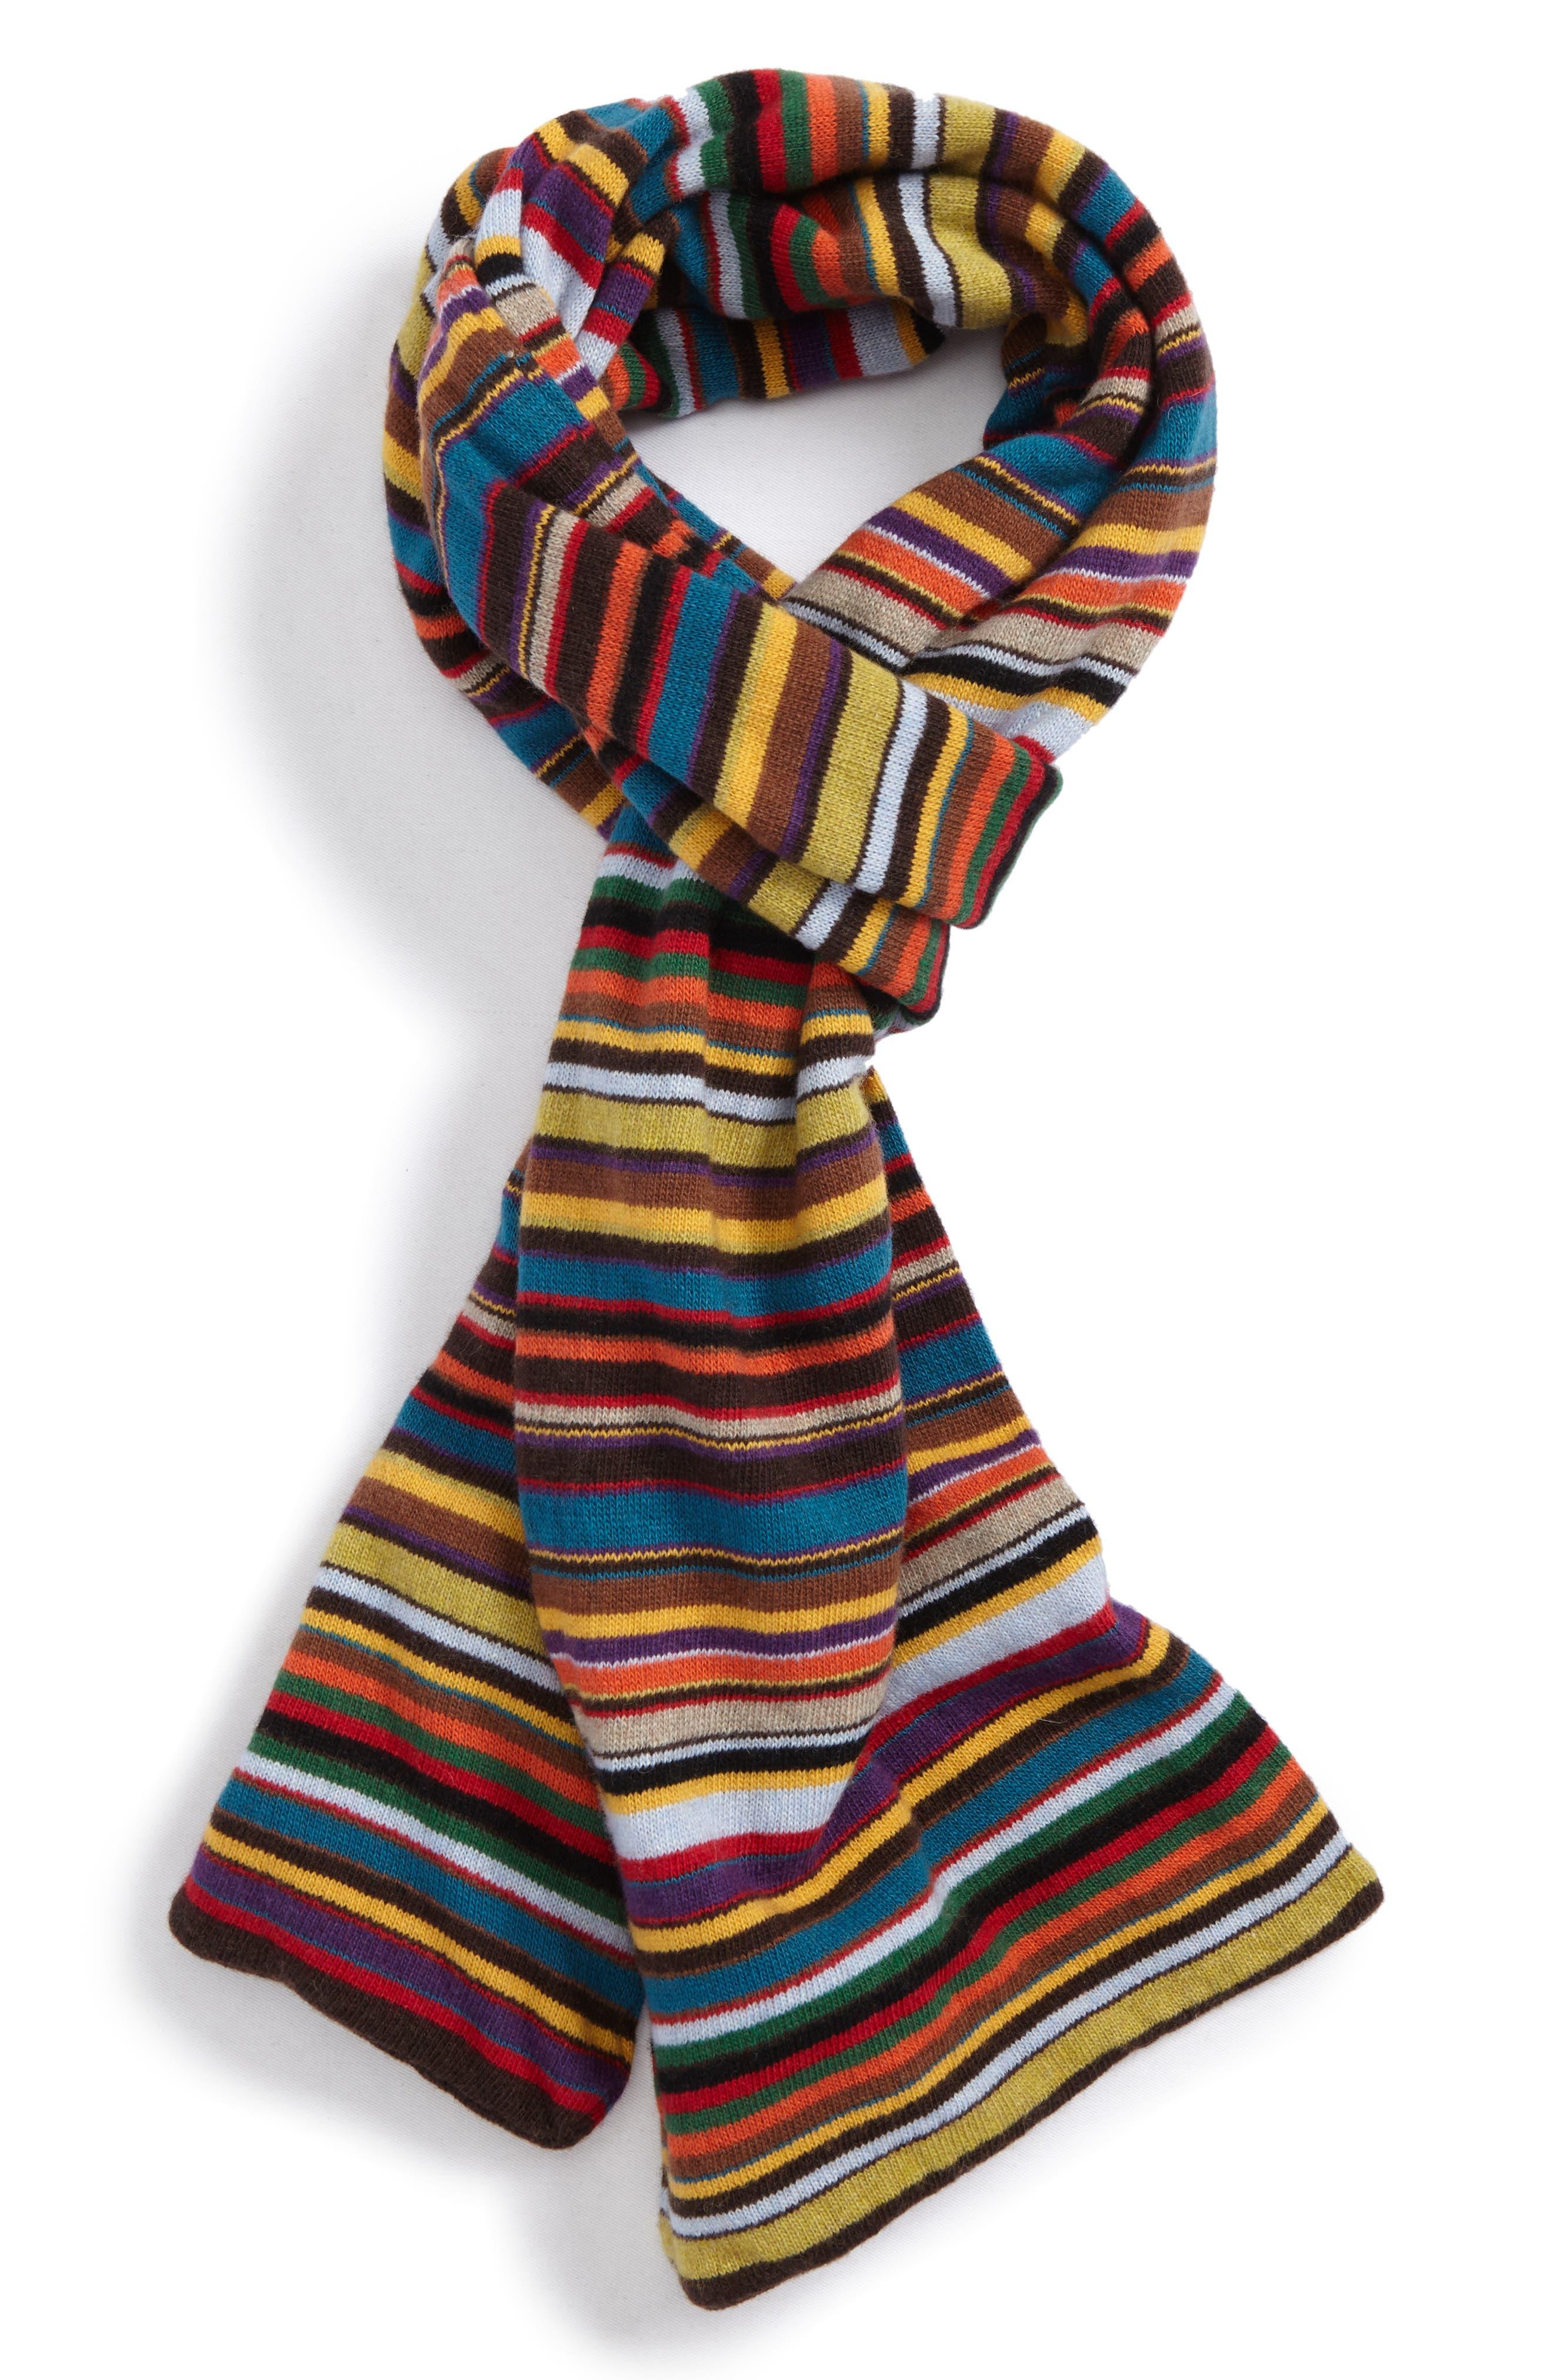 Paul Smith Multistripe Knit Scarf